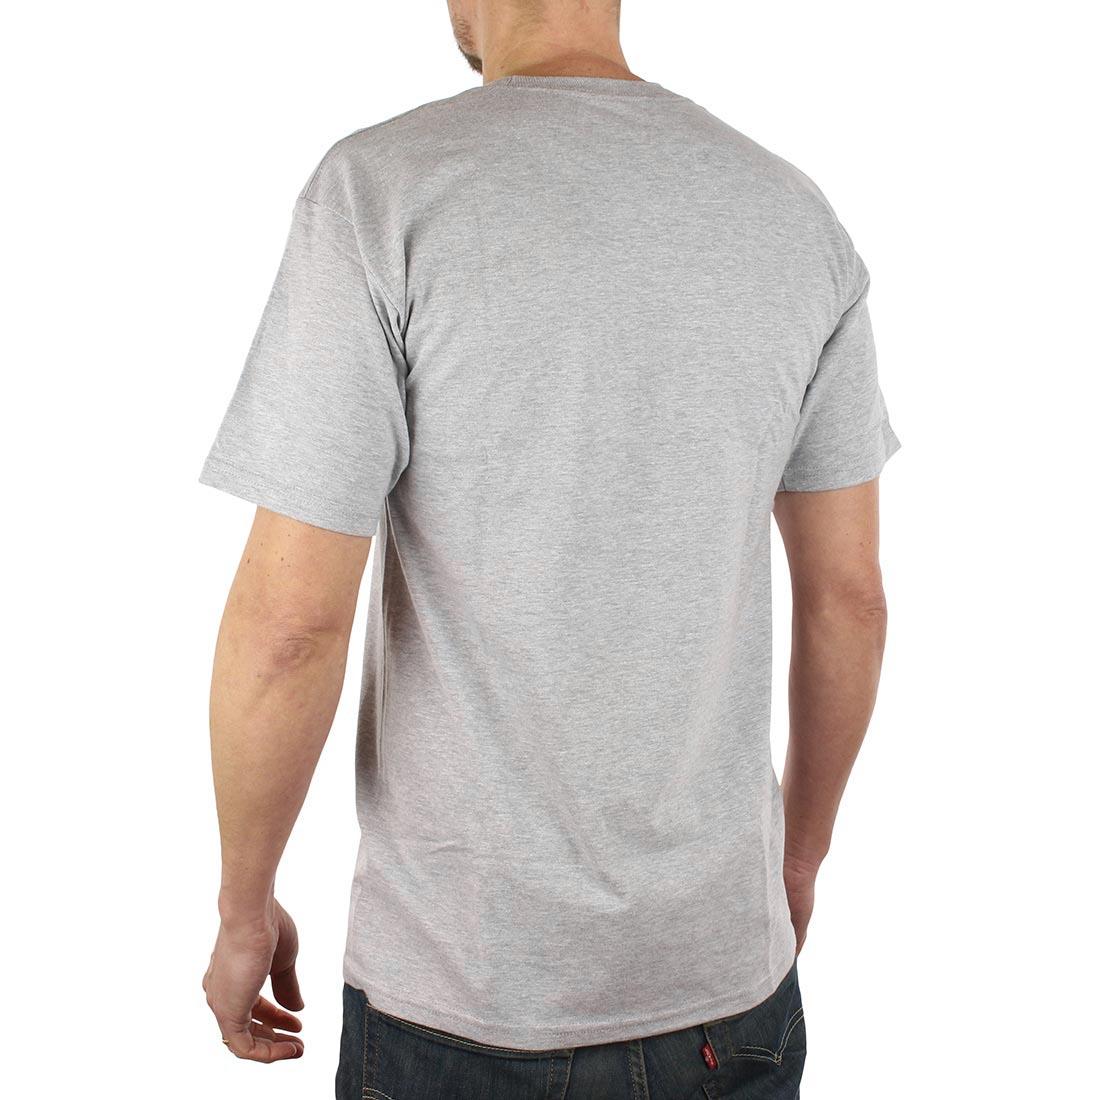 Spitfire Bighead T-Shirt